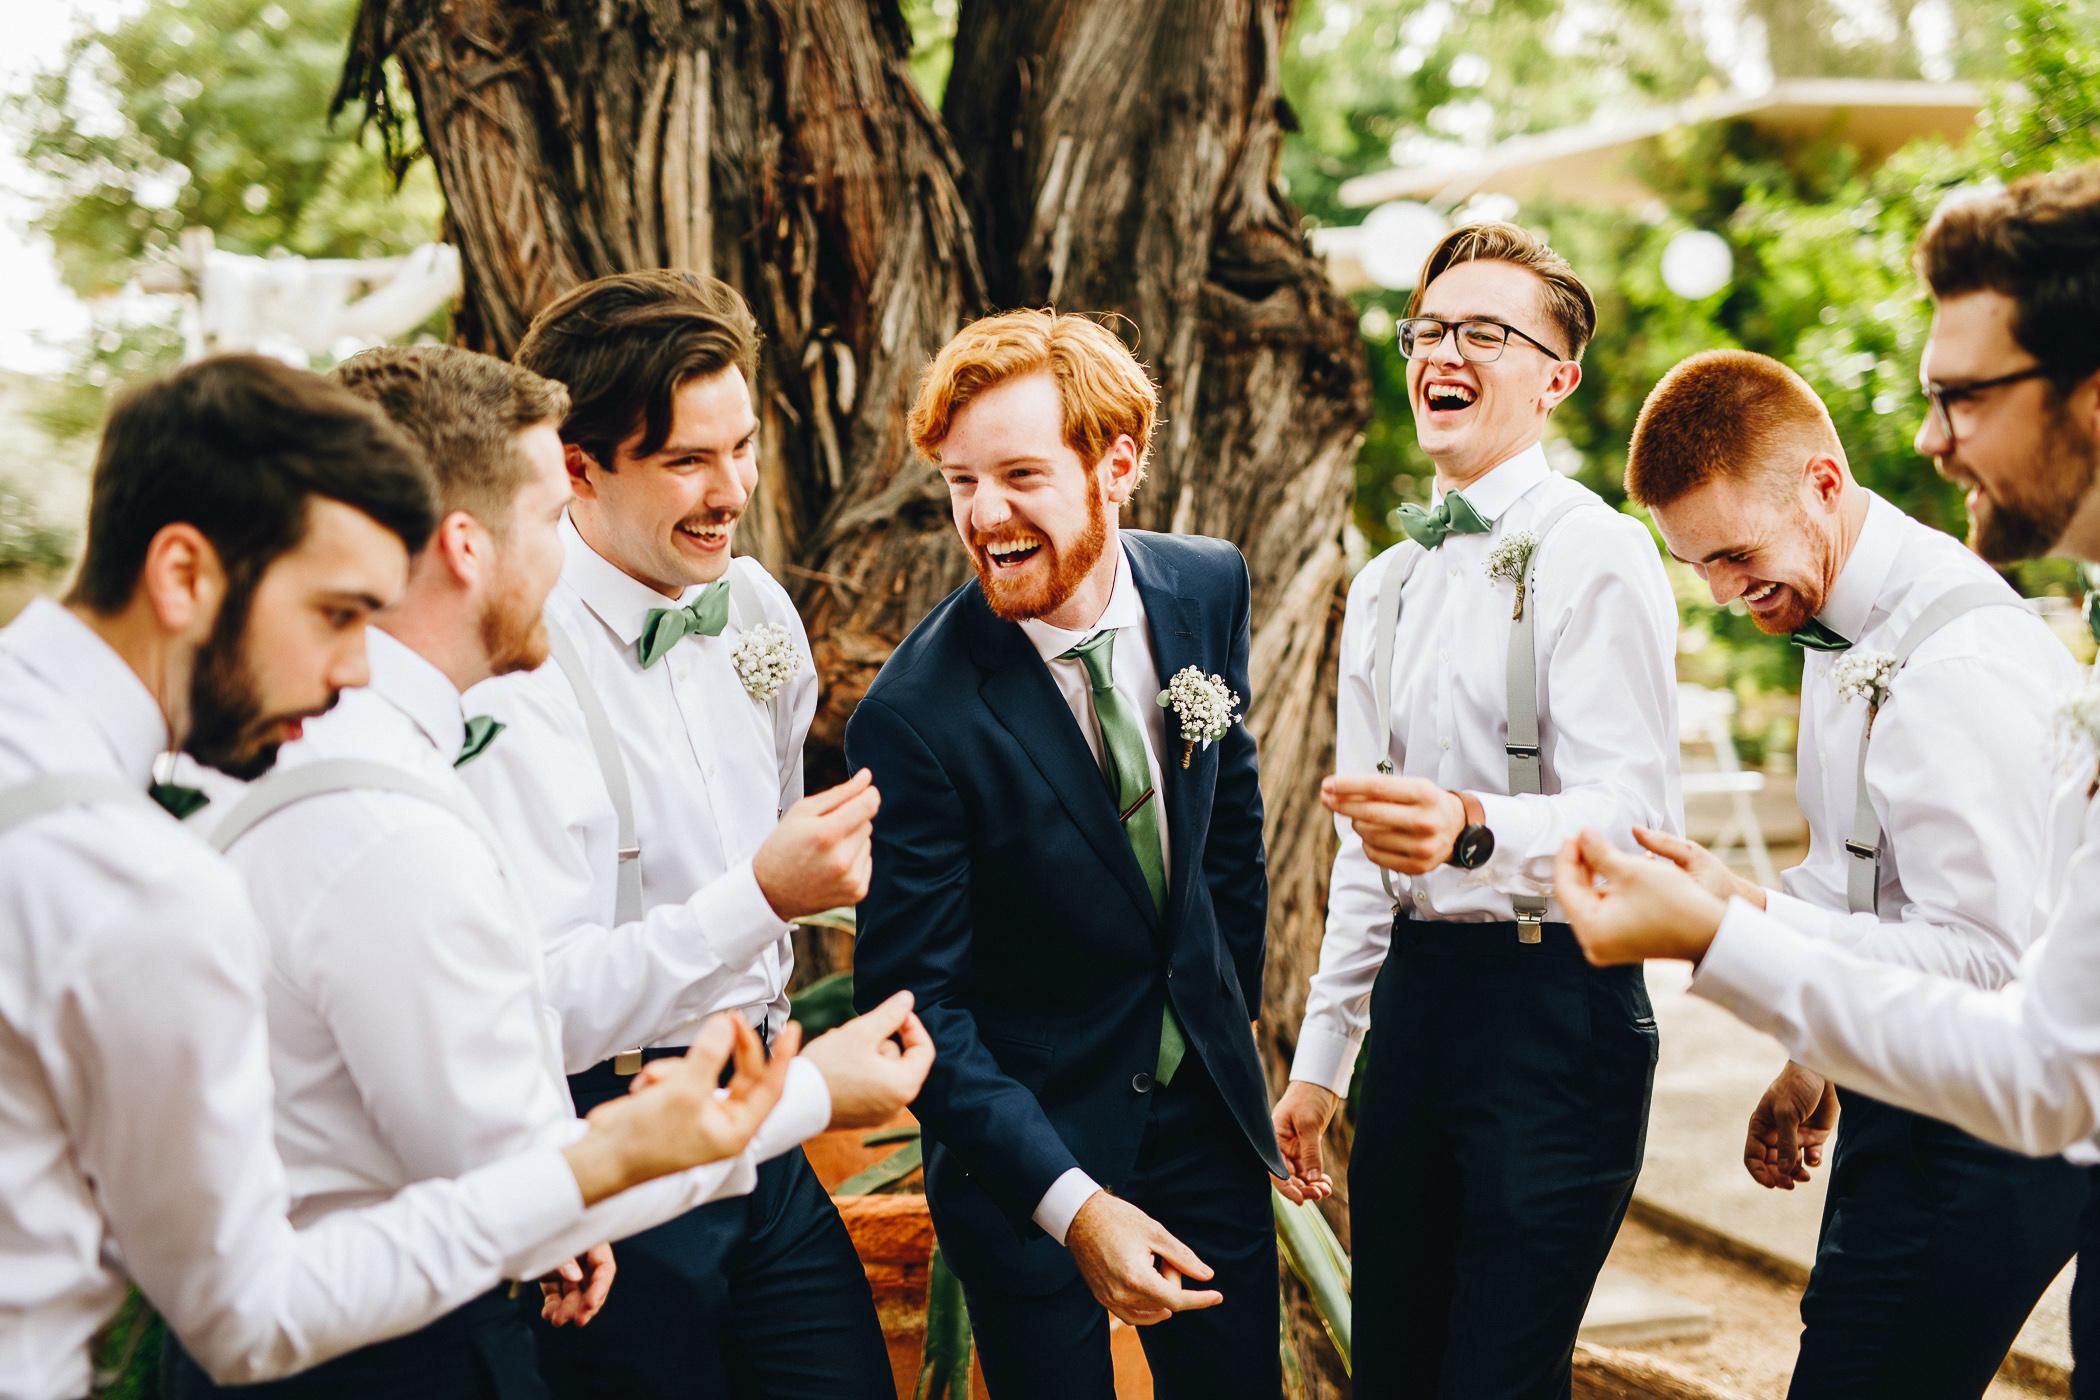 181104-Luxium-Weddings-Arizona-@matt__Le-Brandon-Kariana-Phoenix-Valley-Garden-Center-1037.jpg